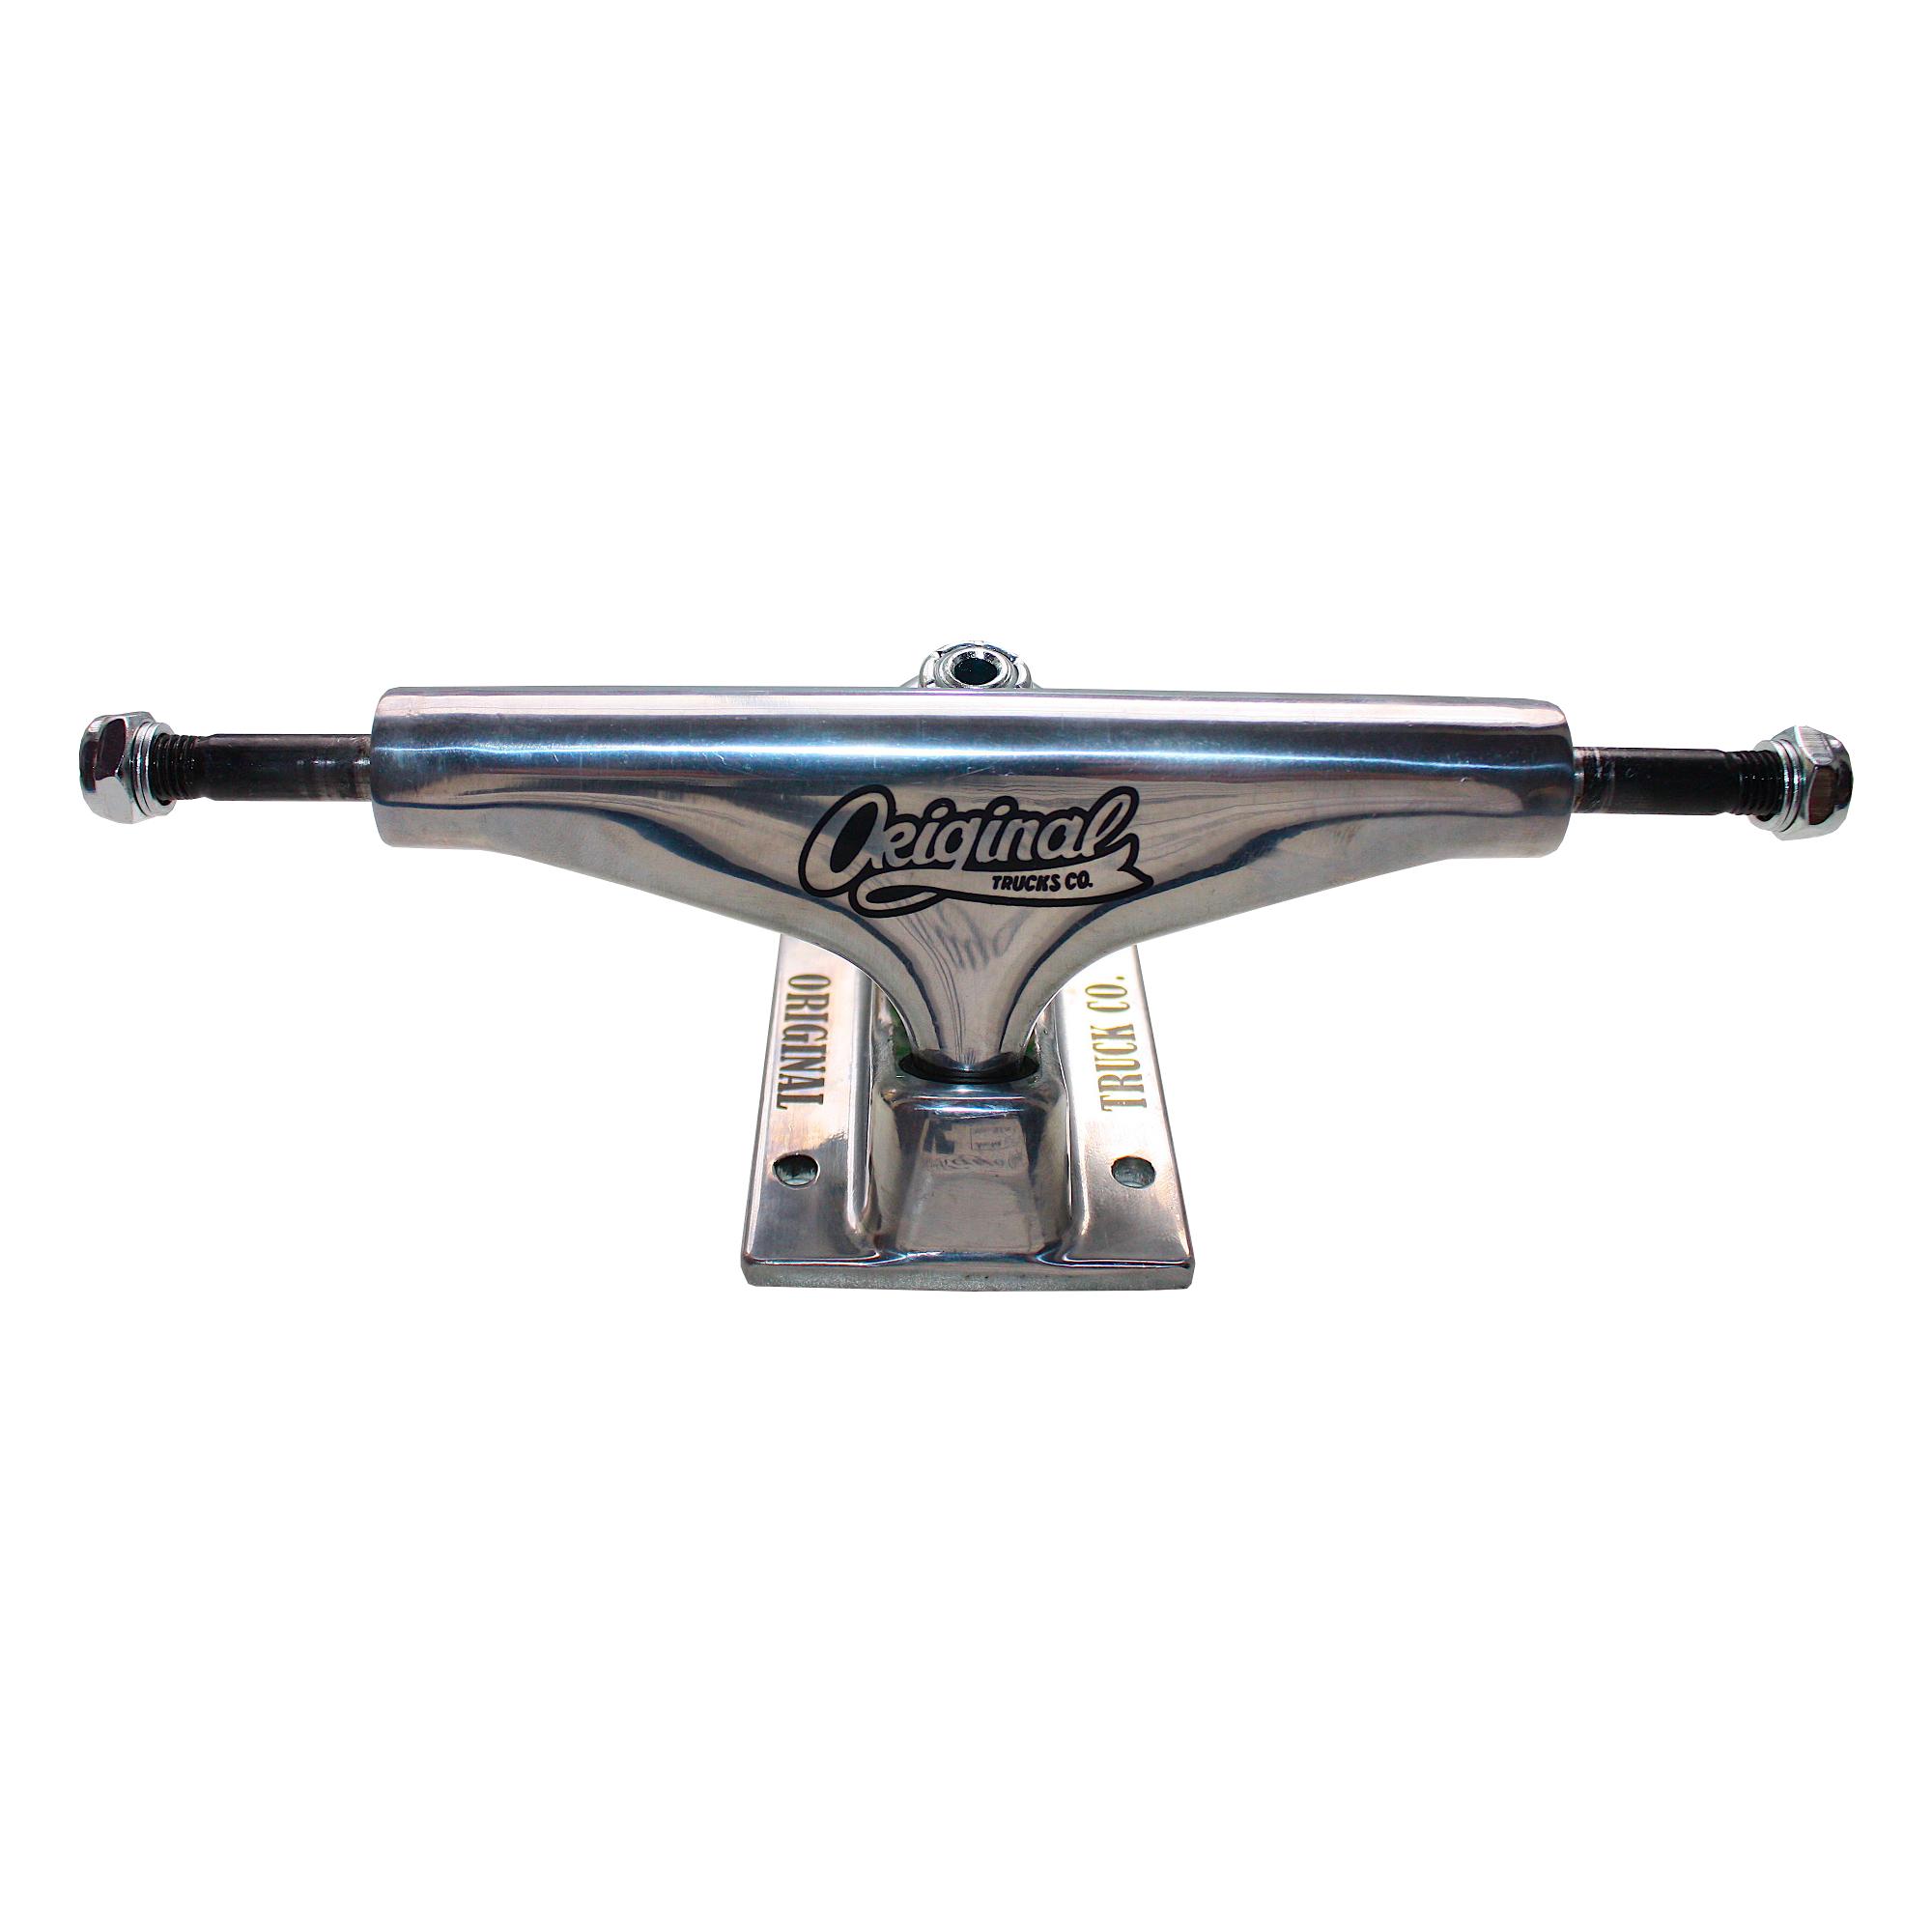 Подвески для скейта ORIGINAL TRUCKS CO. (Silver)